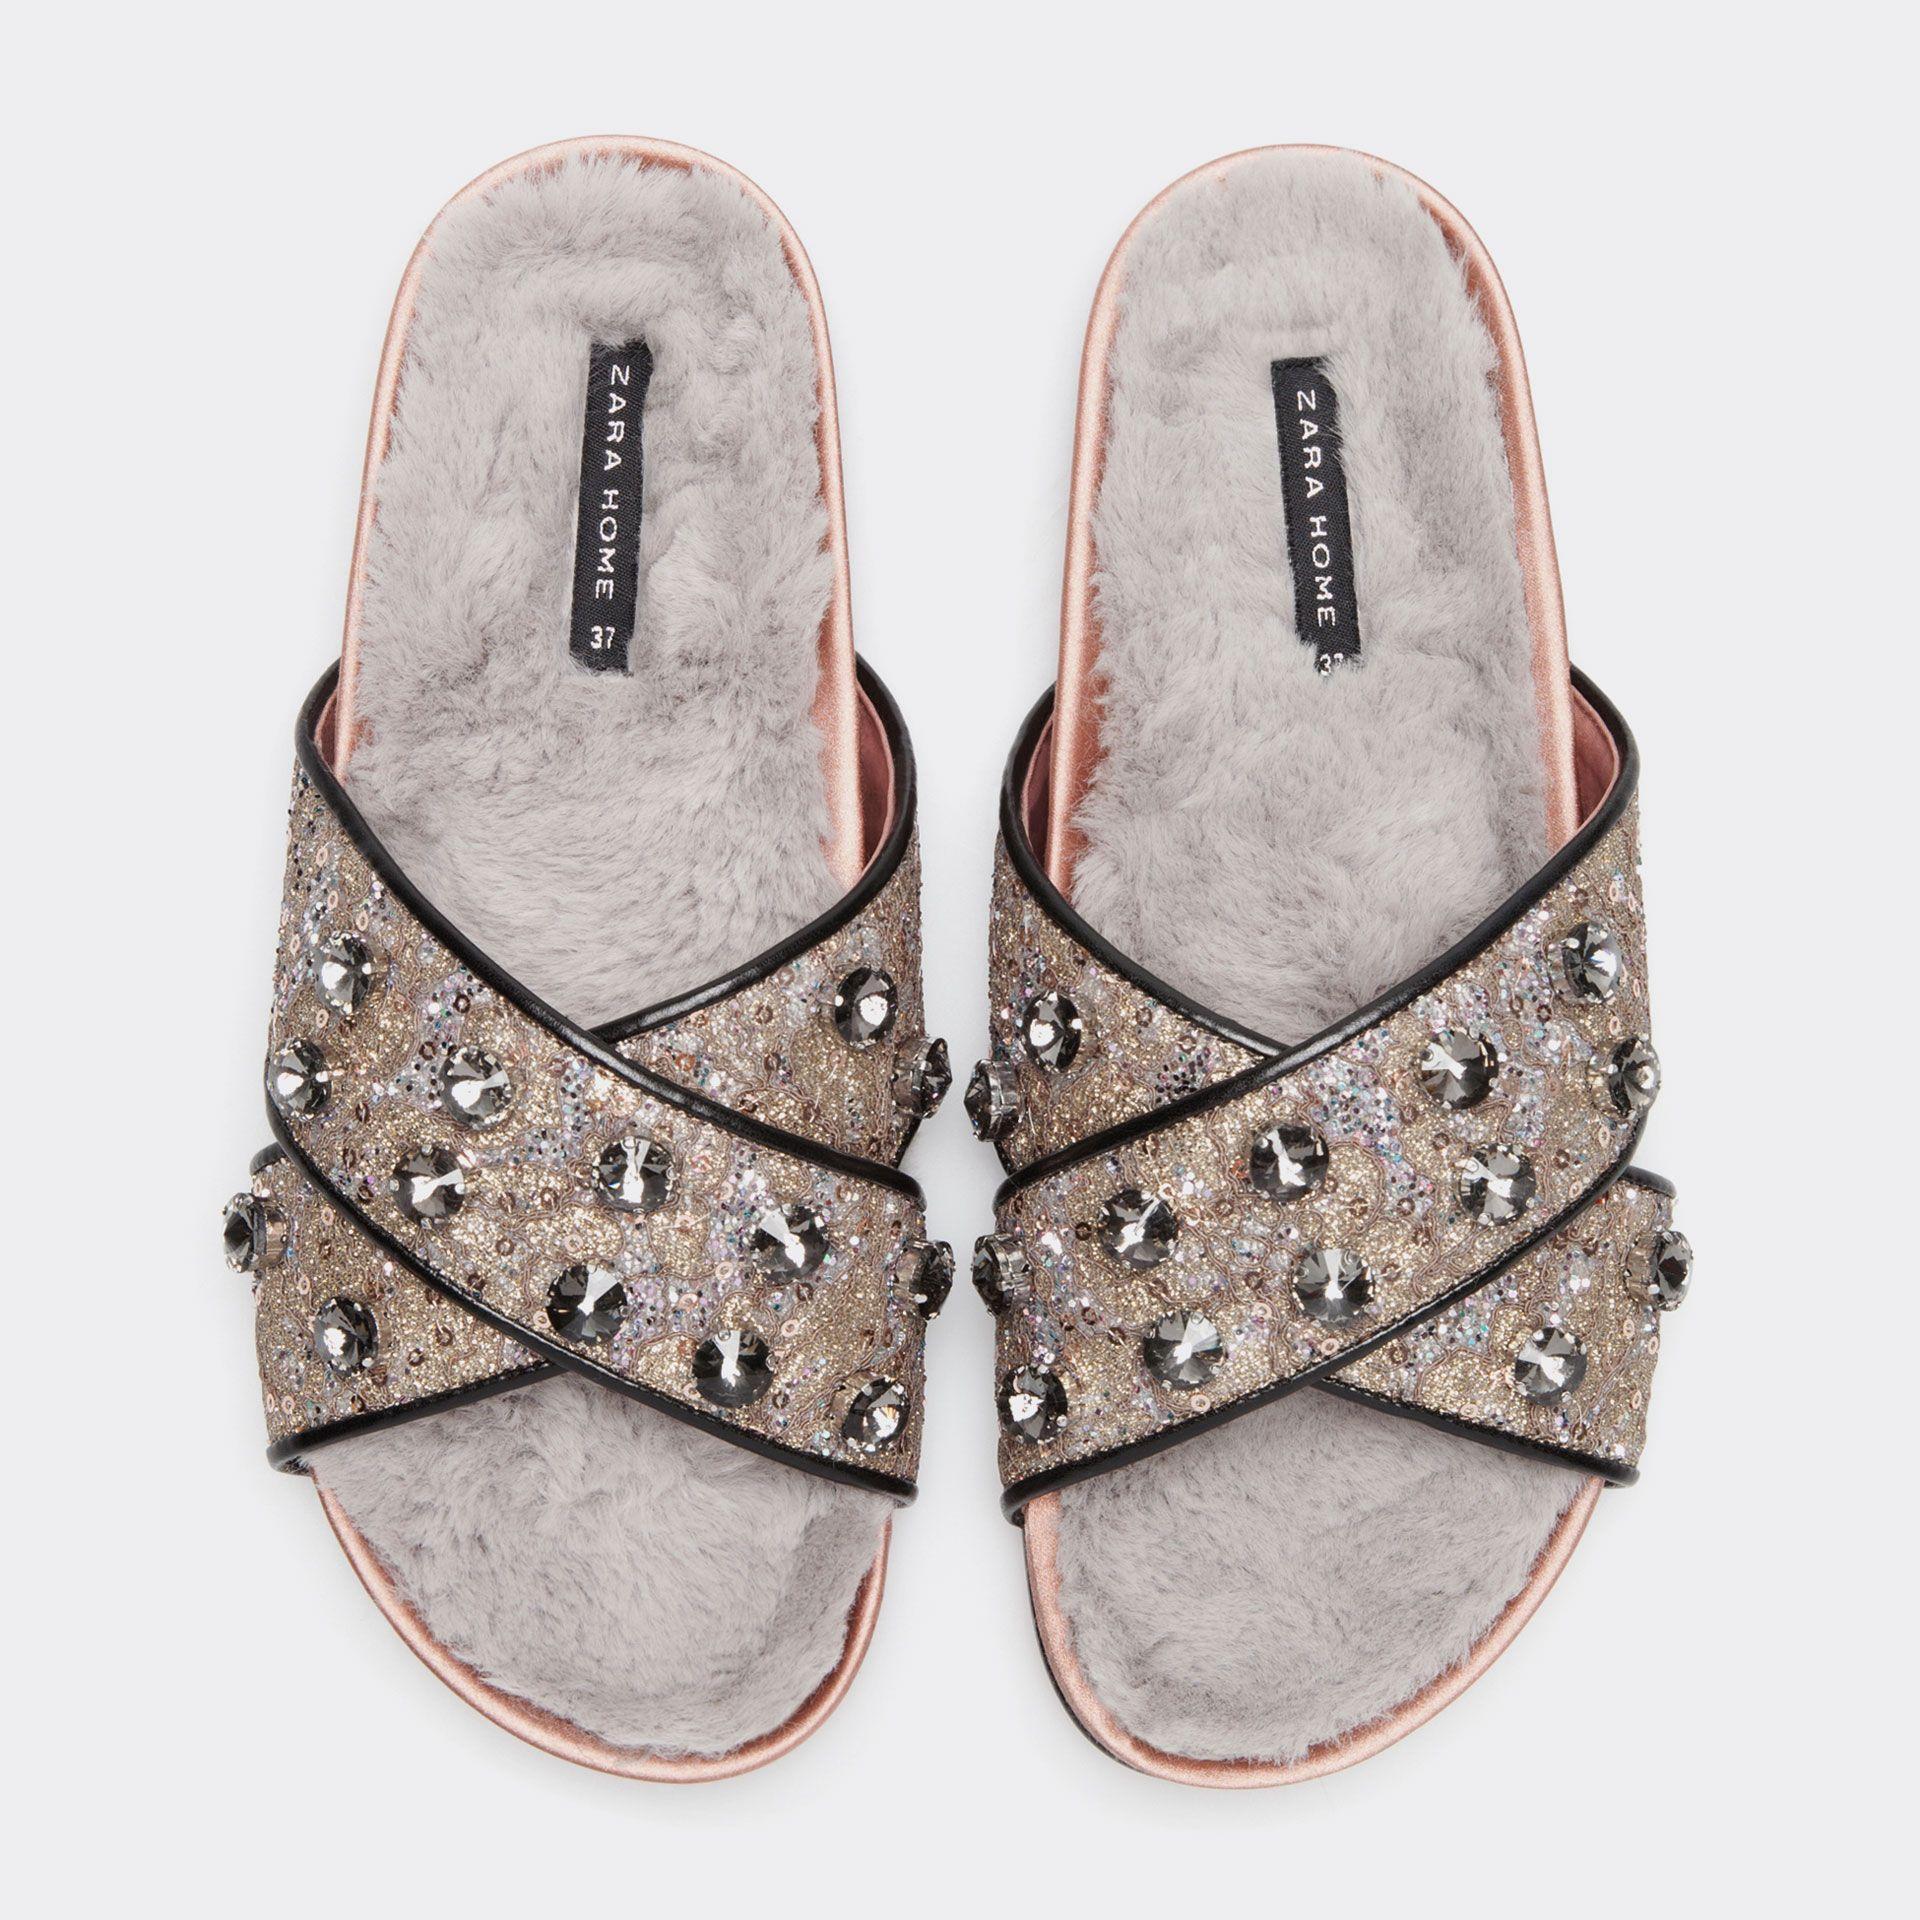 Zara home to open in toronto - Furry Gem Sandals Christmas Women S Homewear Homewear Zara Home South Africa